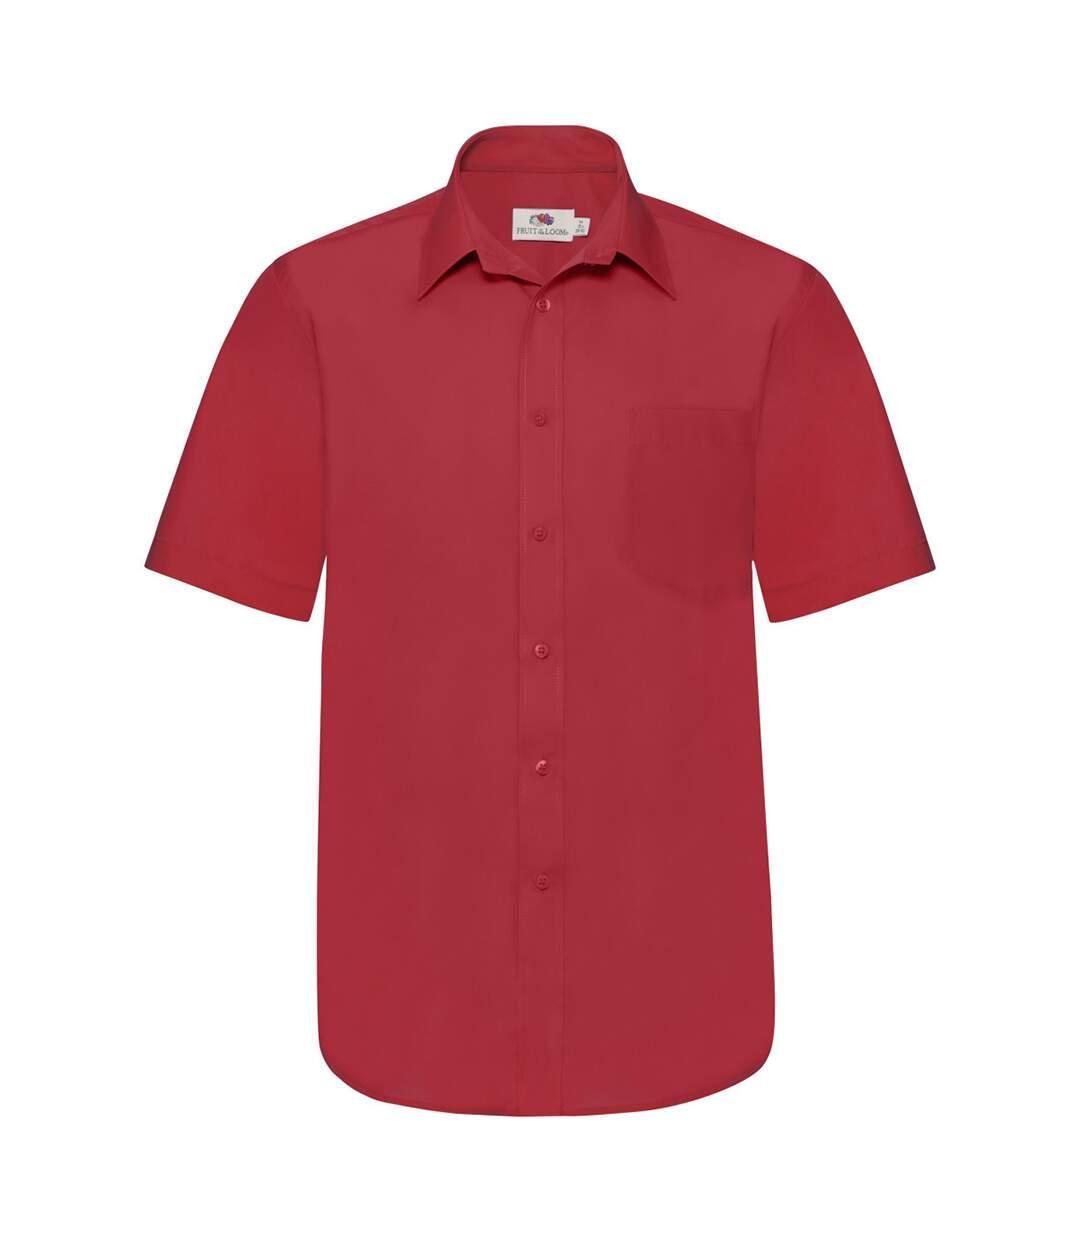 Fruit Of The Loom Mens Short Sleeve Poplin Shirt (Red) - UTBC404